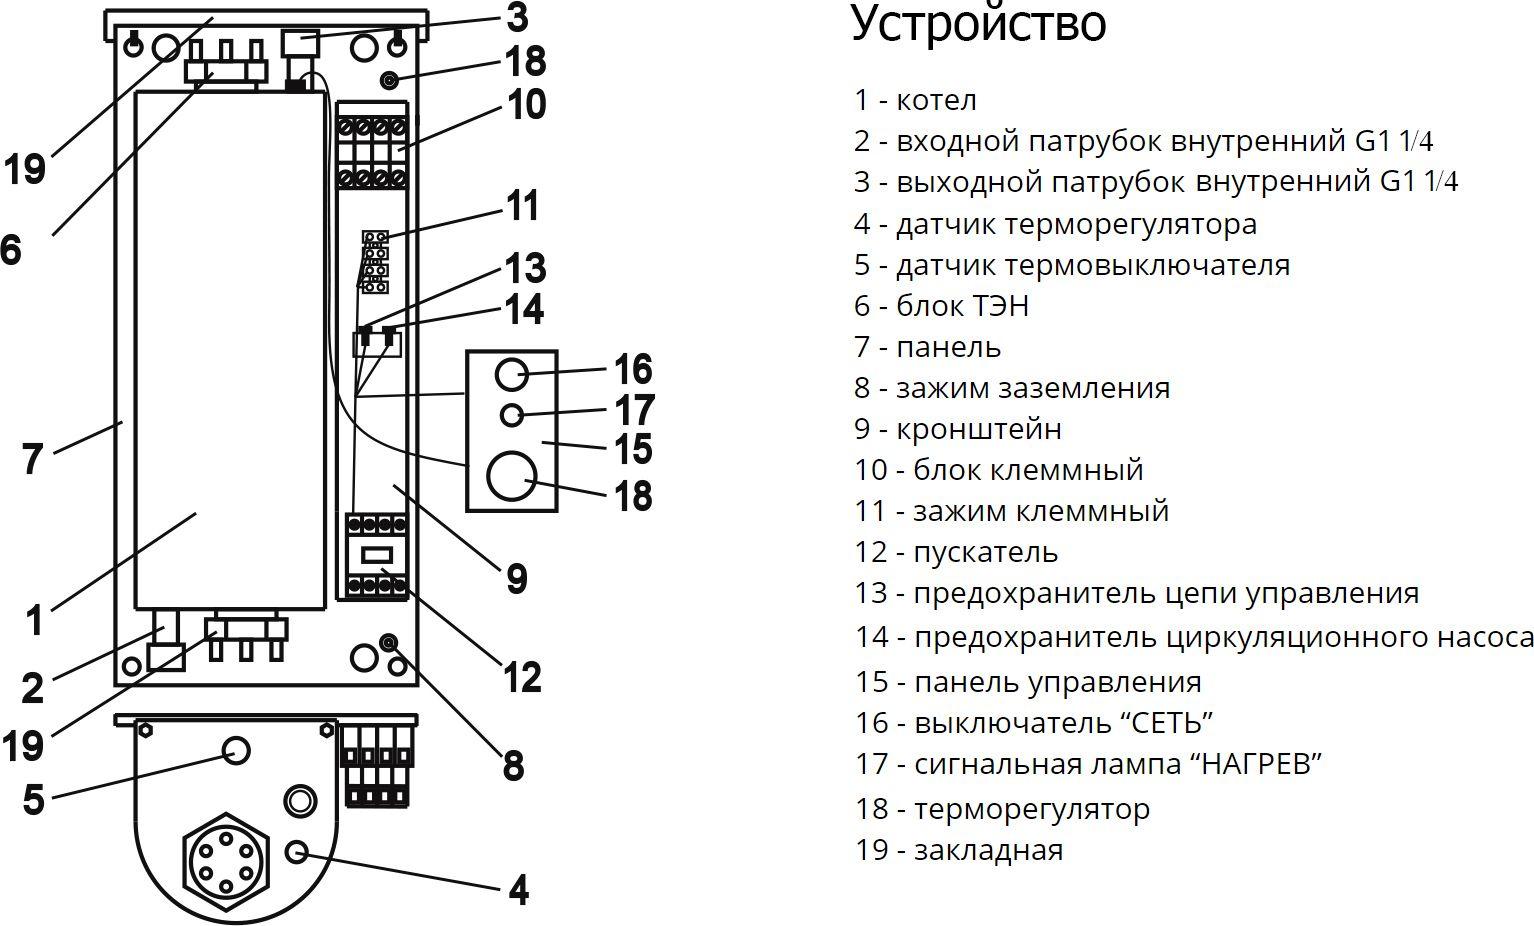 Особенности электрического котла эван, плюсы и минусы аппарата